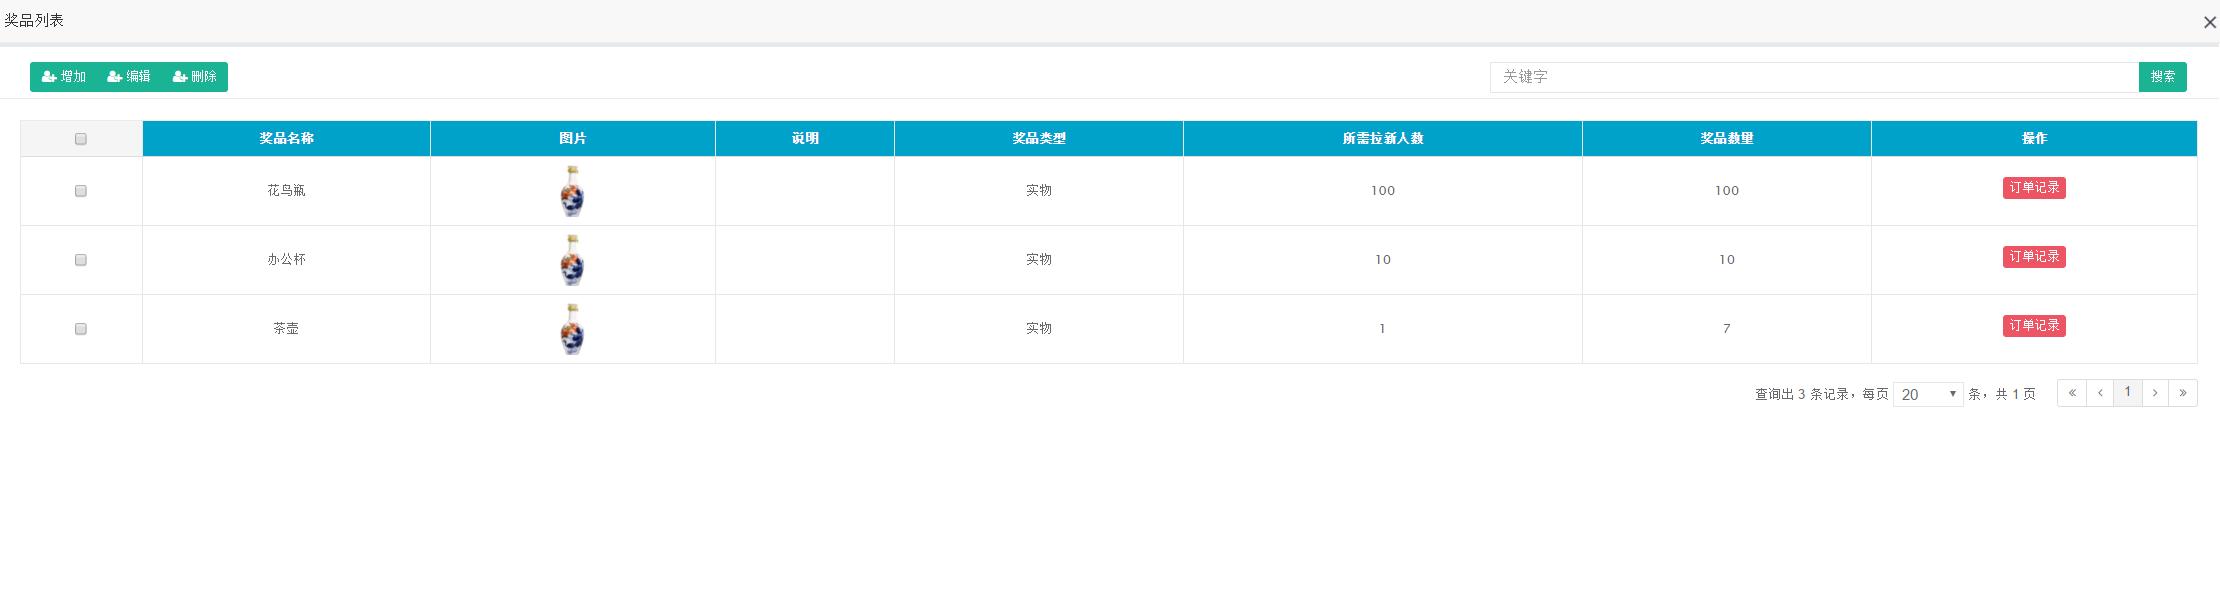 5-奖品列表.png